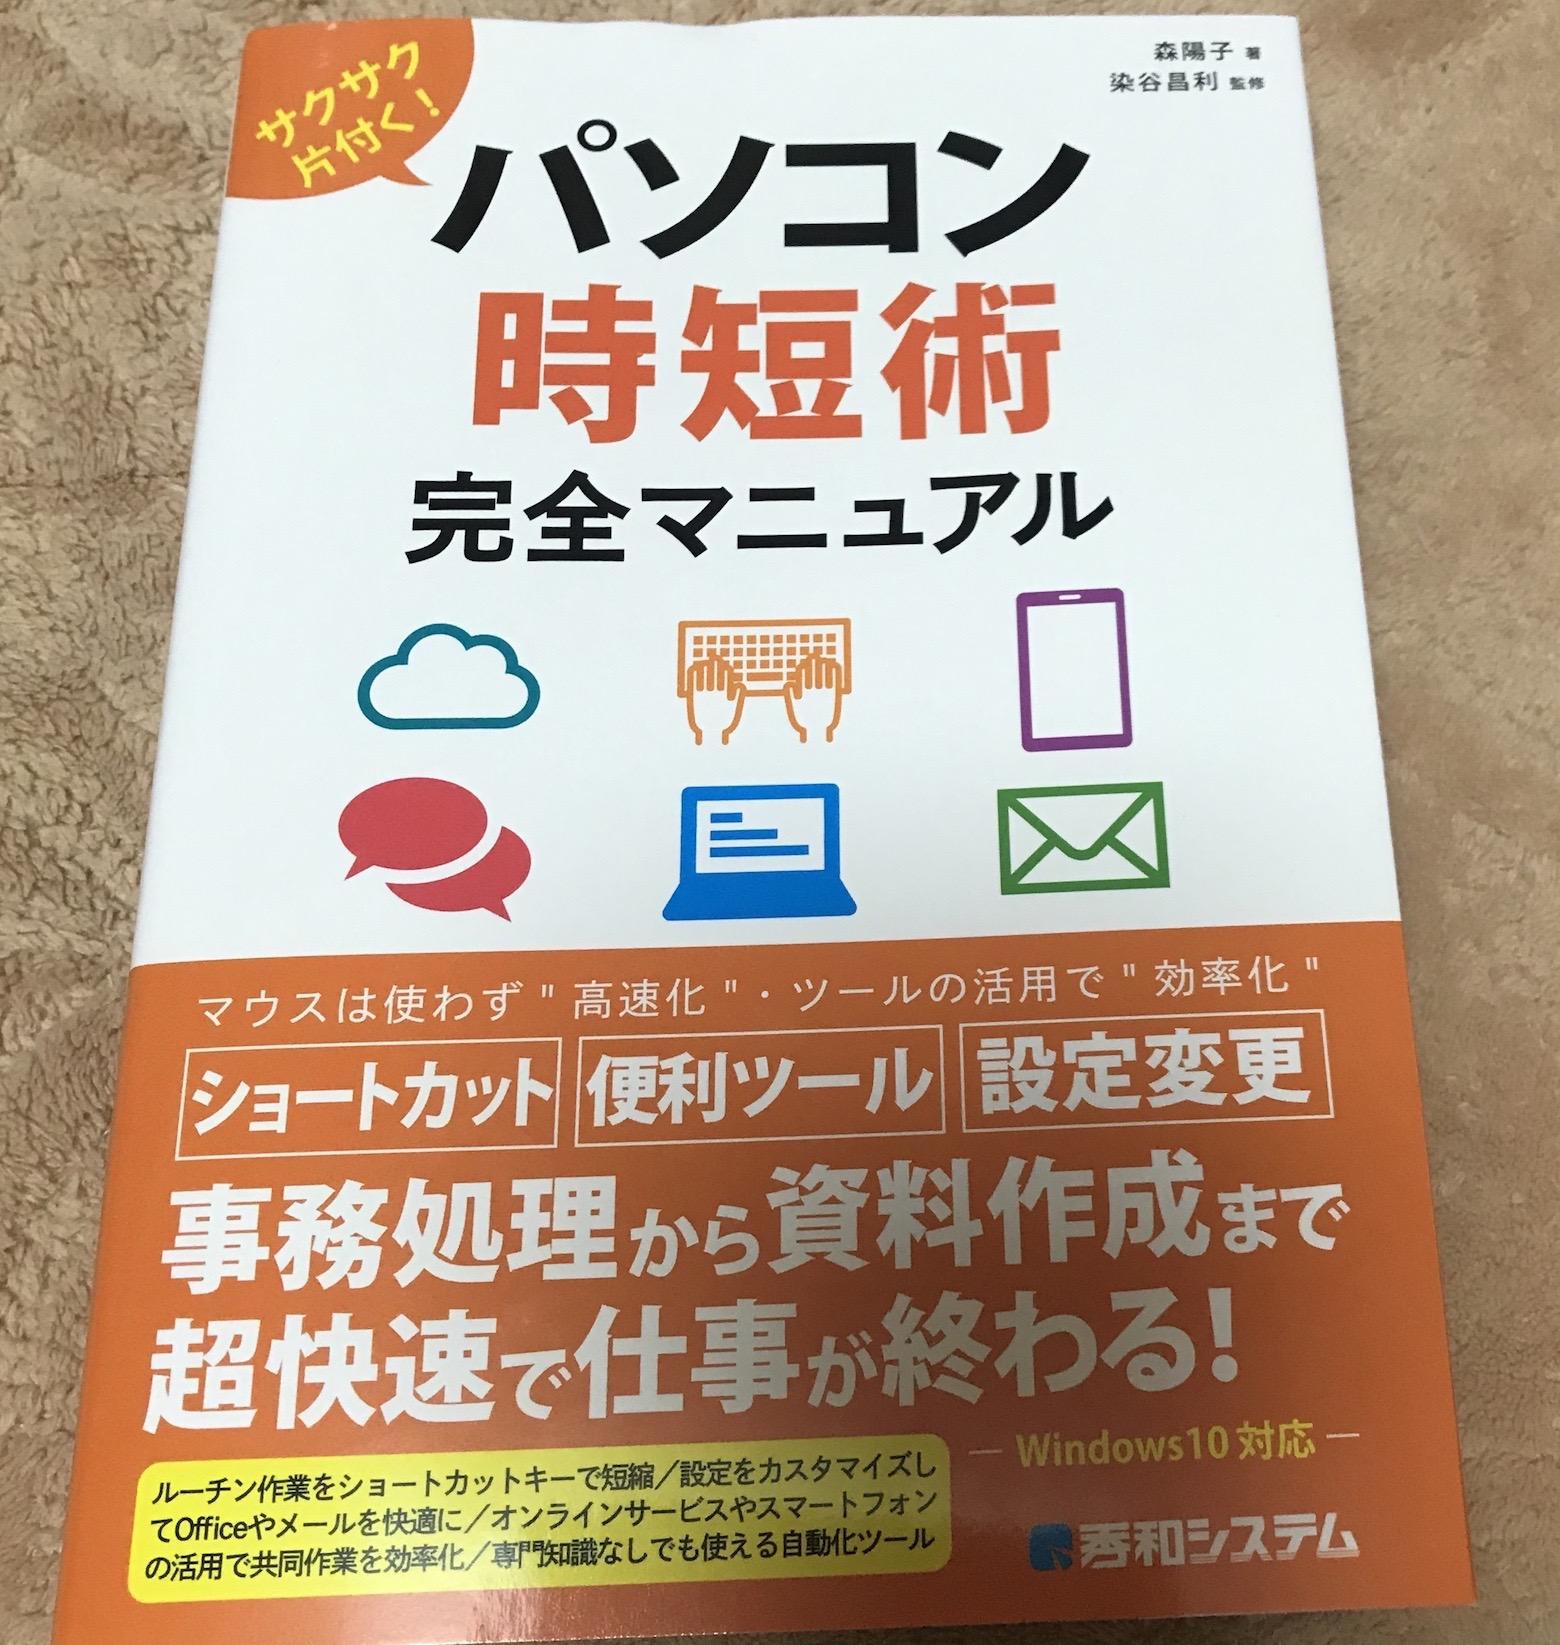 Pc jitan manual